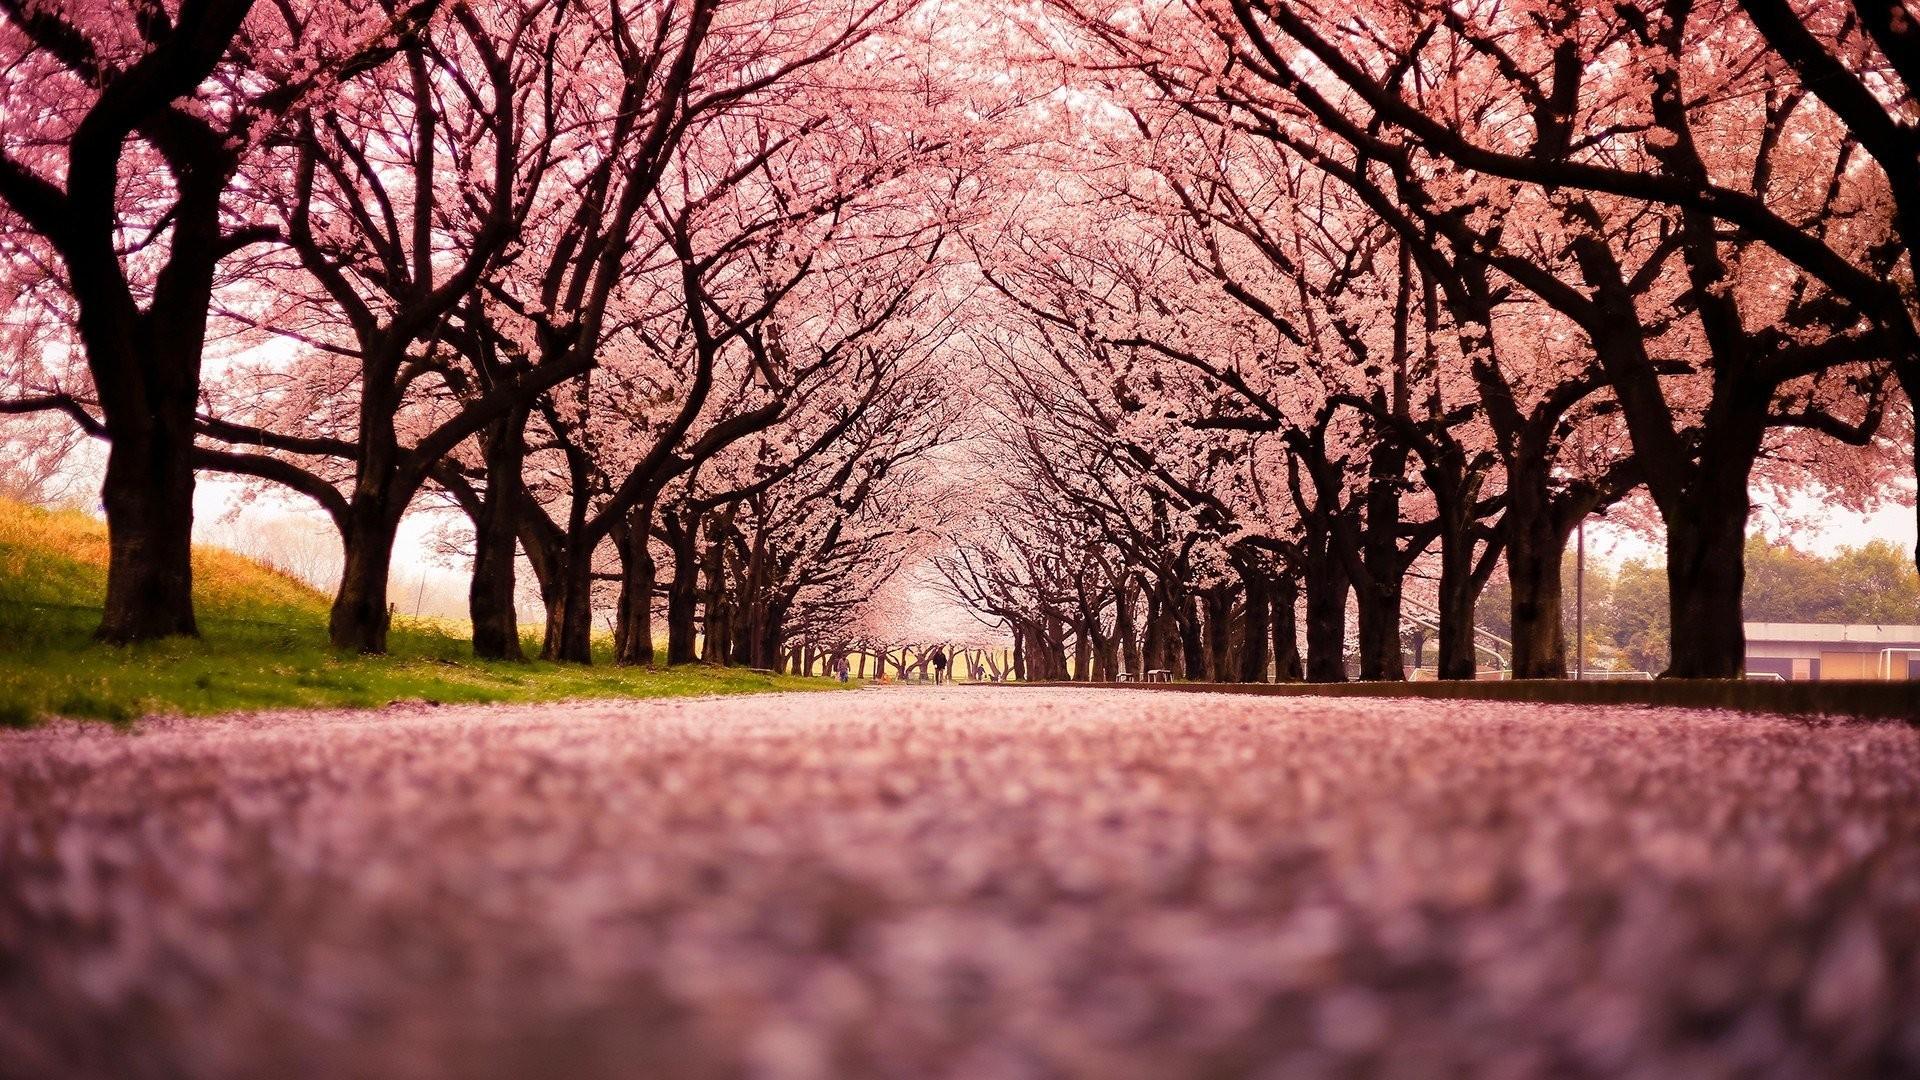 Trees Japan Peach Windows Desktop Wallpaper Nature Detail